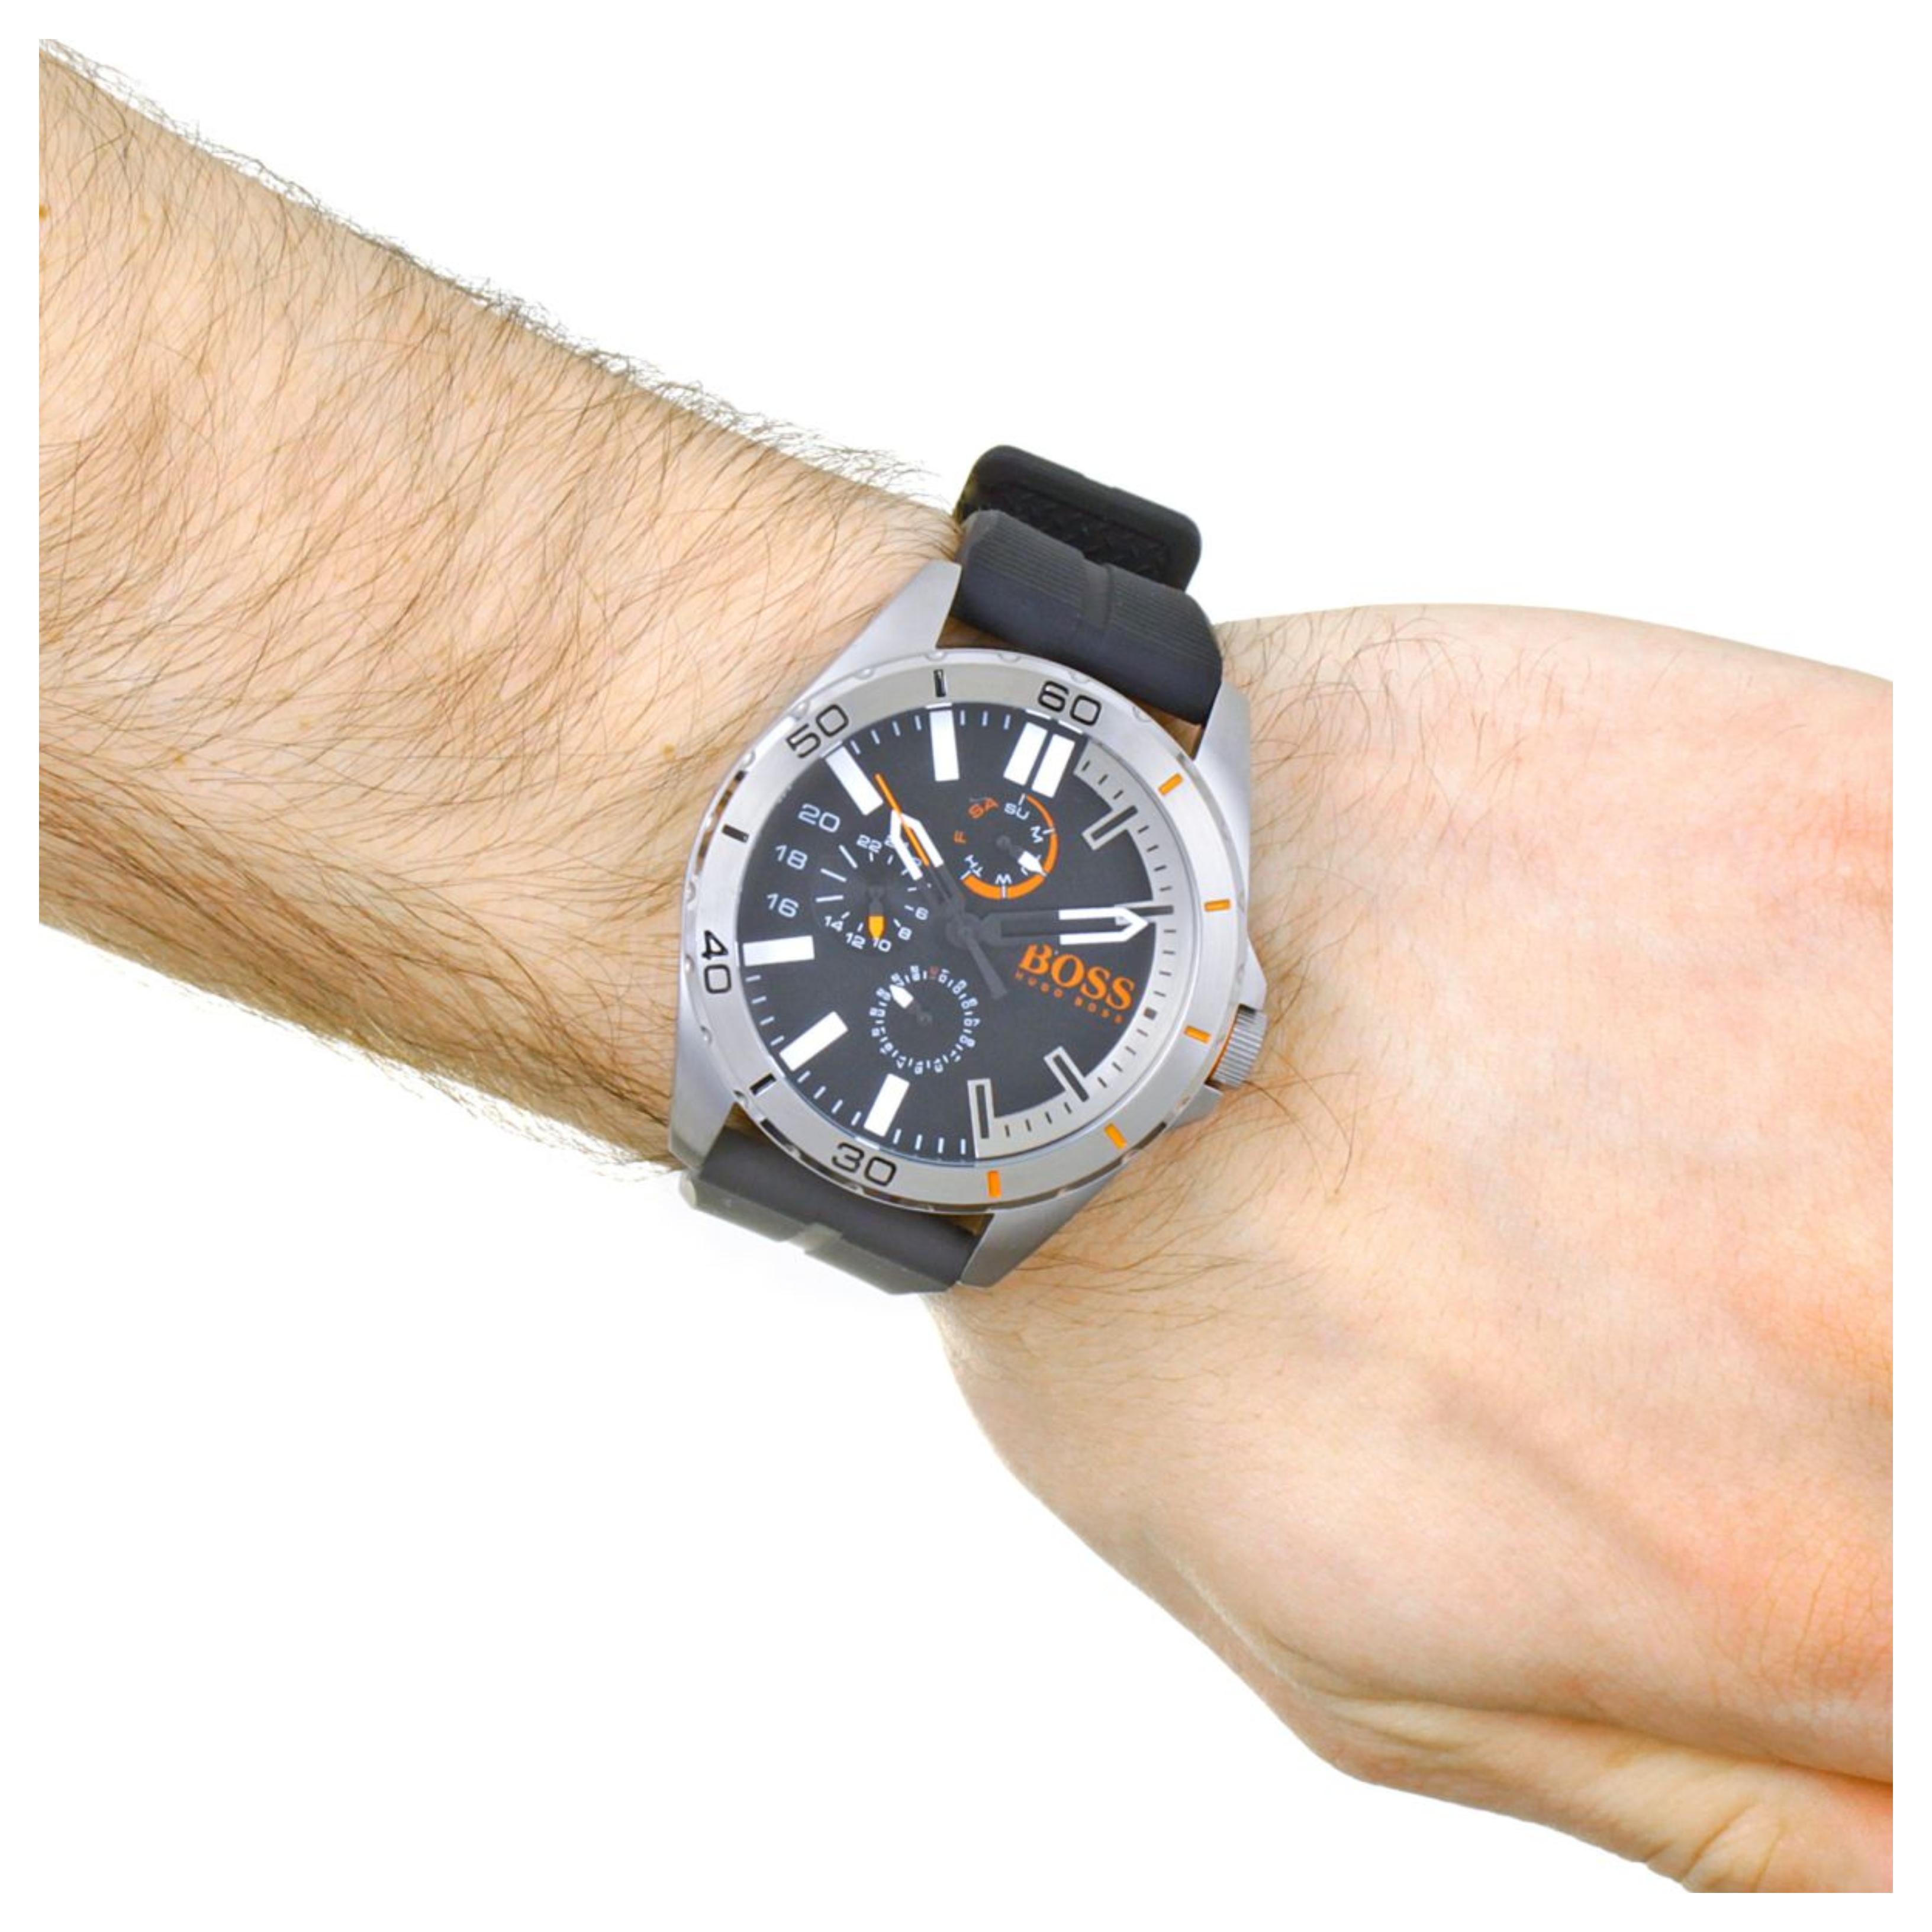 cb61d1126 Hugo Boss Orange Berlin Men's Watch|Chrono Dial|Black Silicone Strap|1513290  Thumbnail